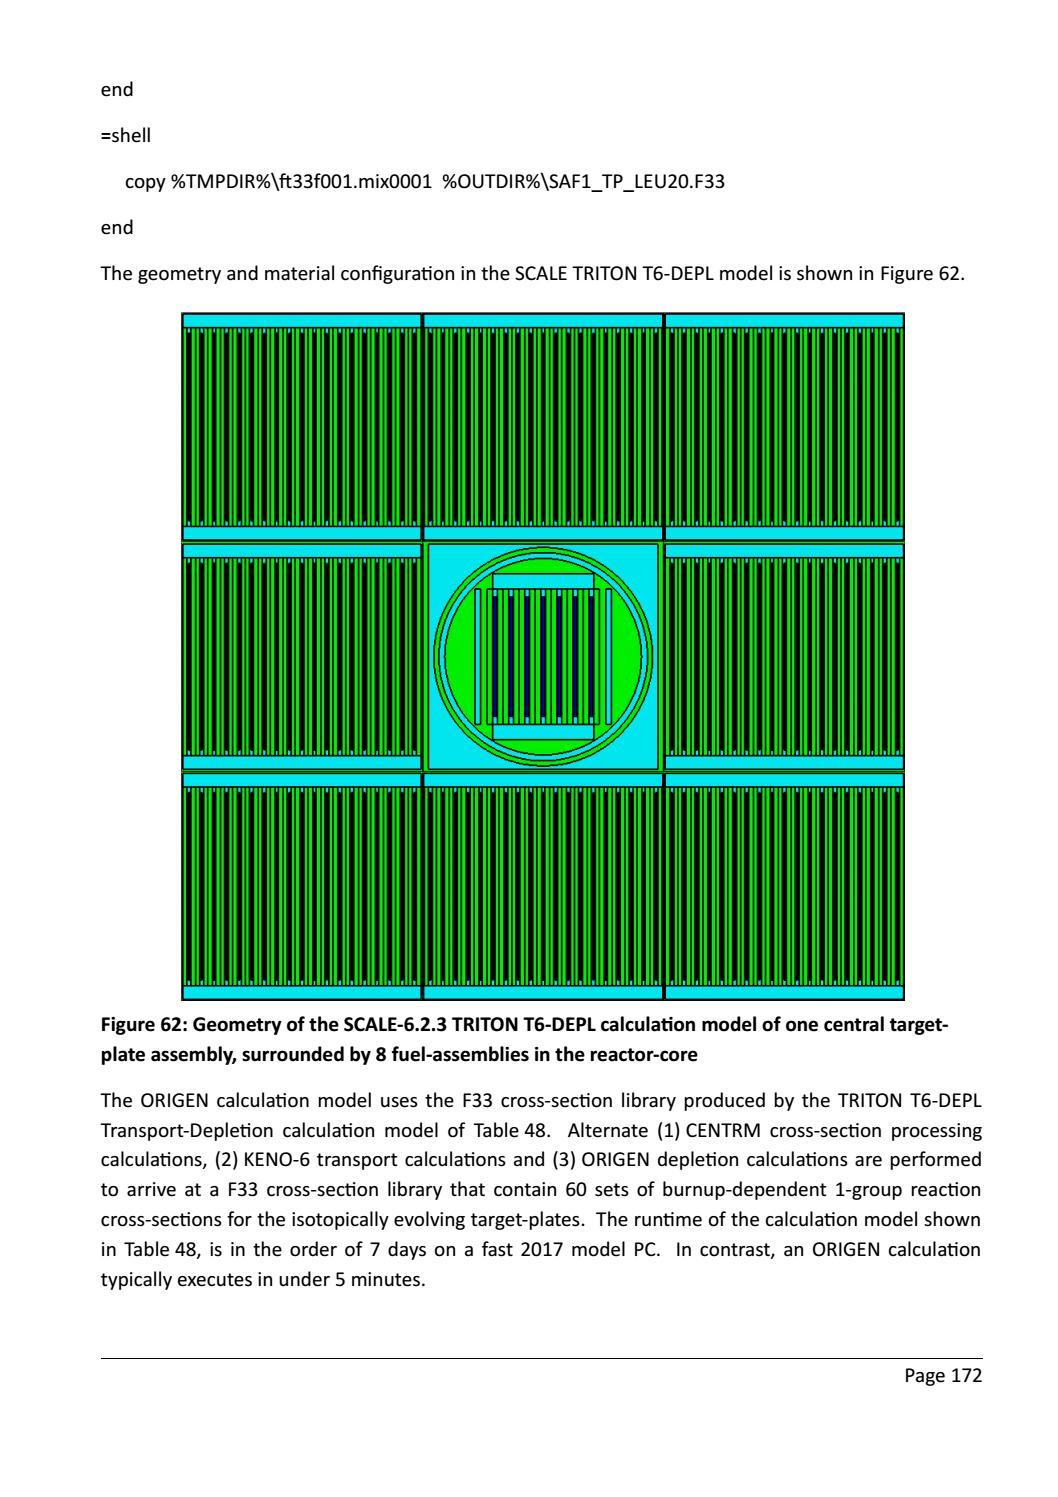 RADIOACTIVE WASTE: COMPUTATIONAL CHARACTERISATION and SHIELDING page 197